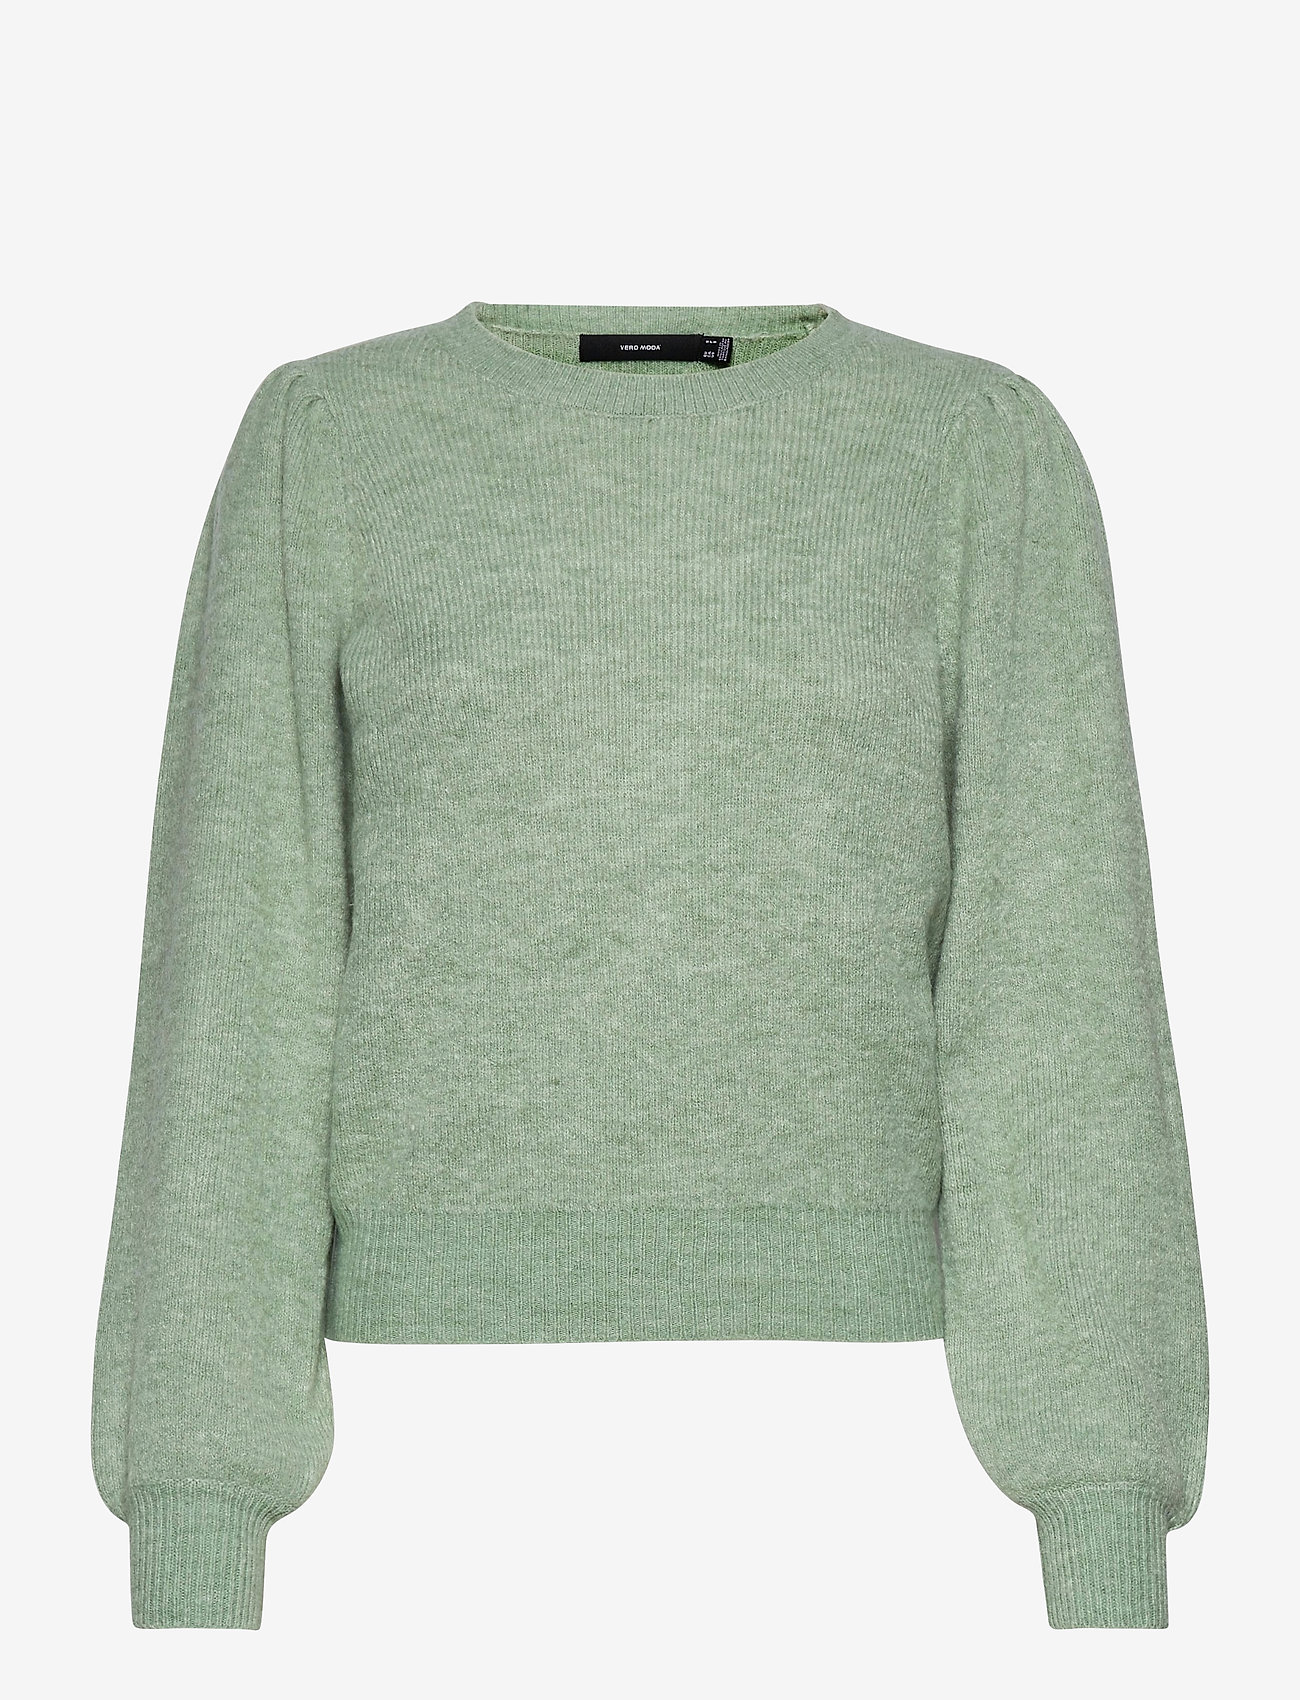 Vero Moda - VMLEFILE PUFF LS BLOUSE REP - tröjor - jadeite - 0